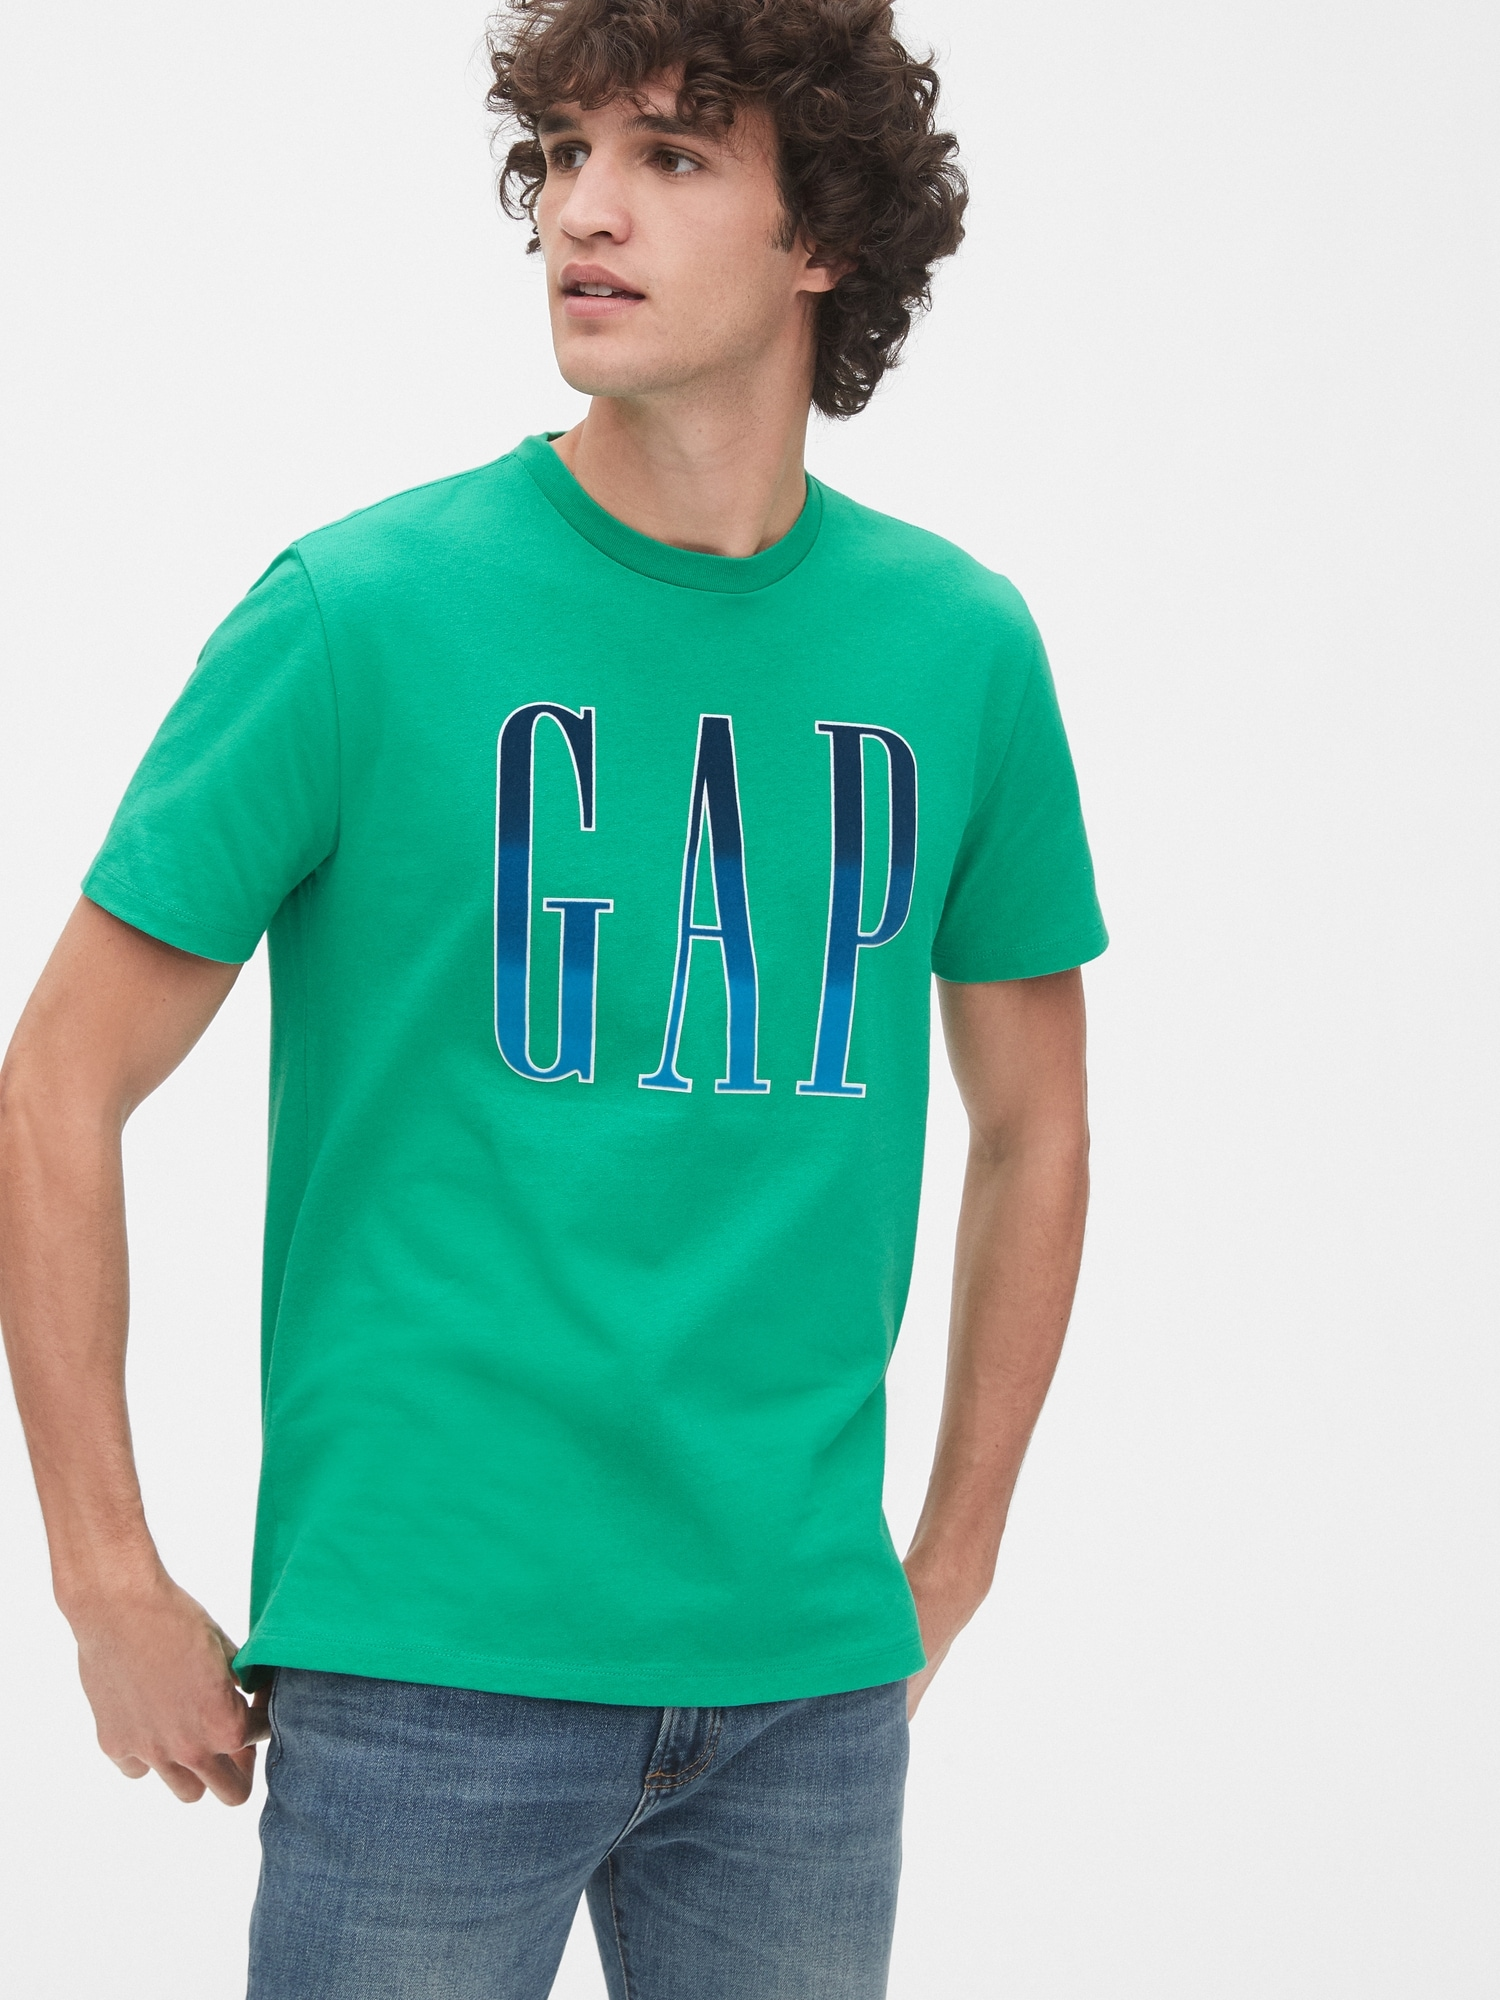 Gapロゴクルーネックtシャツ